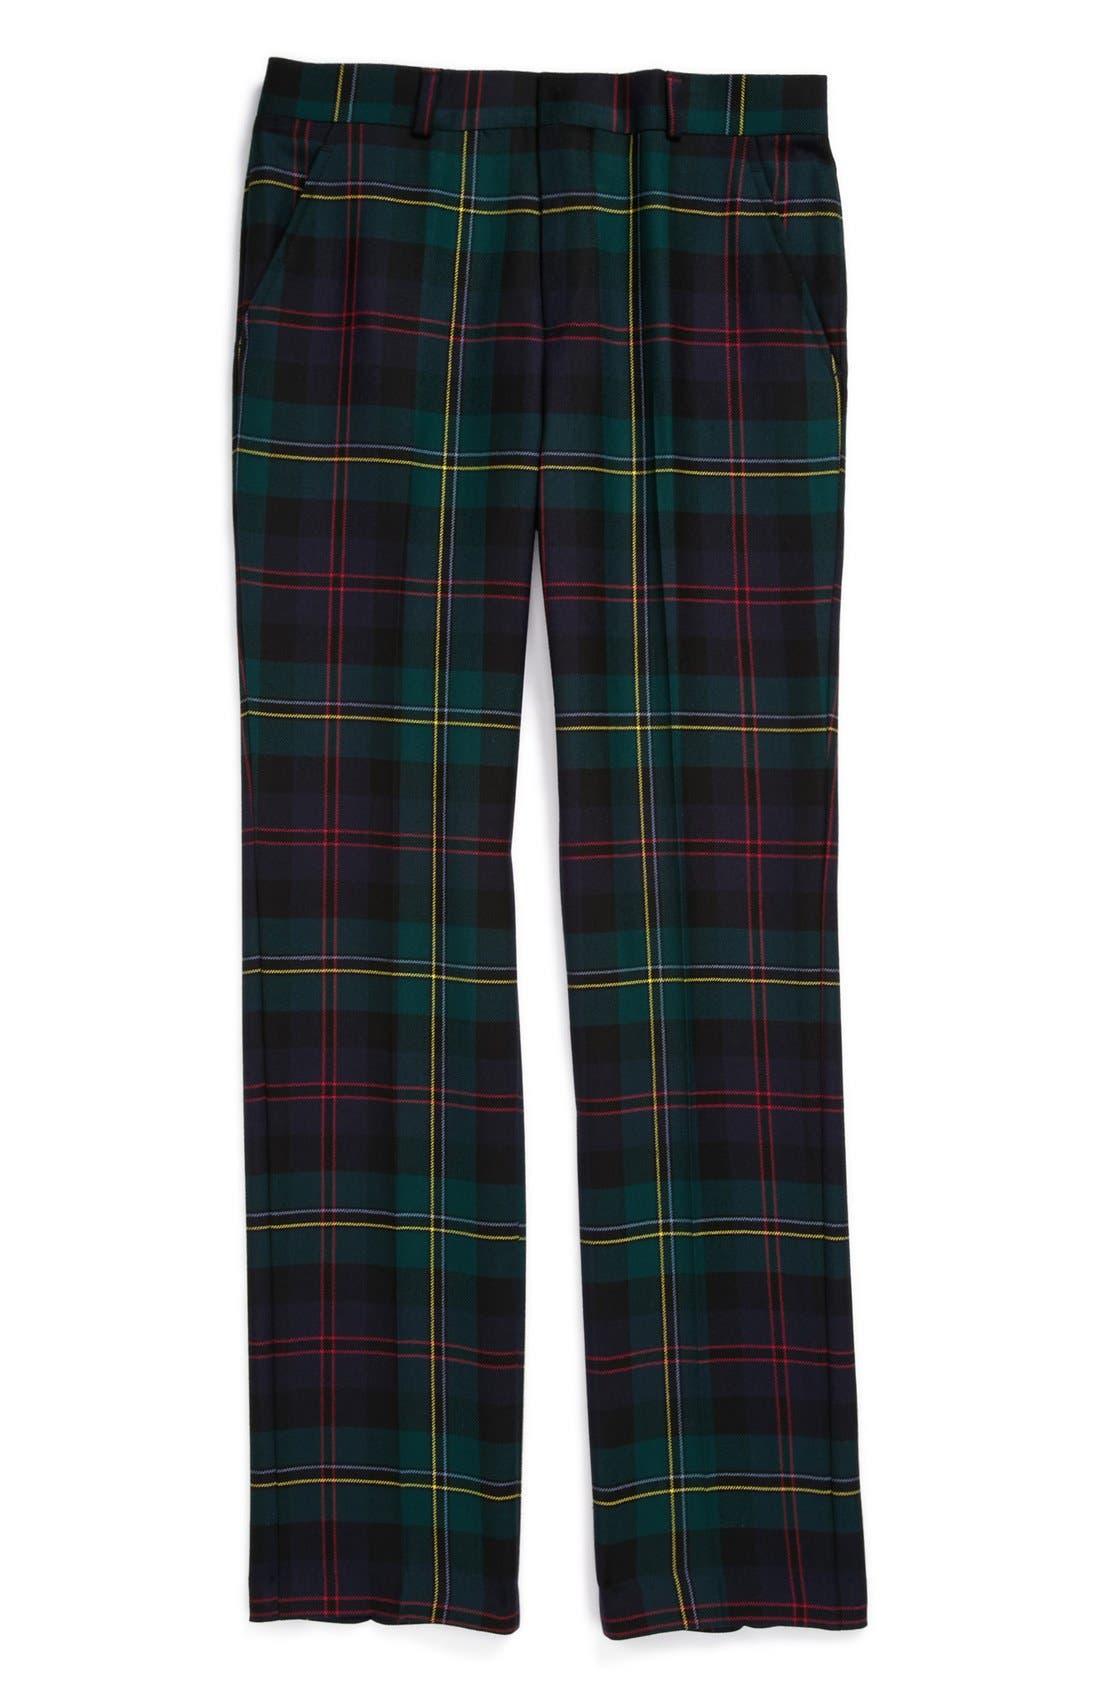 Main Image - Brooks Brothers 'Malcolm' Plaid Pants (Big Boys)